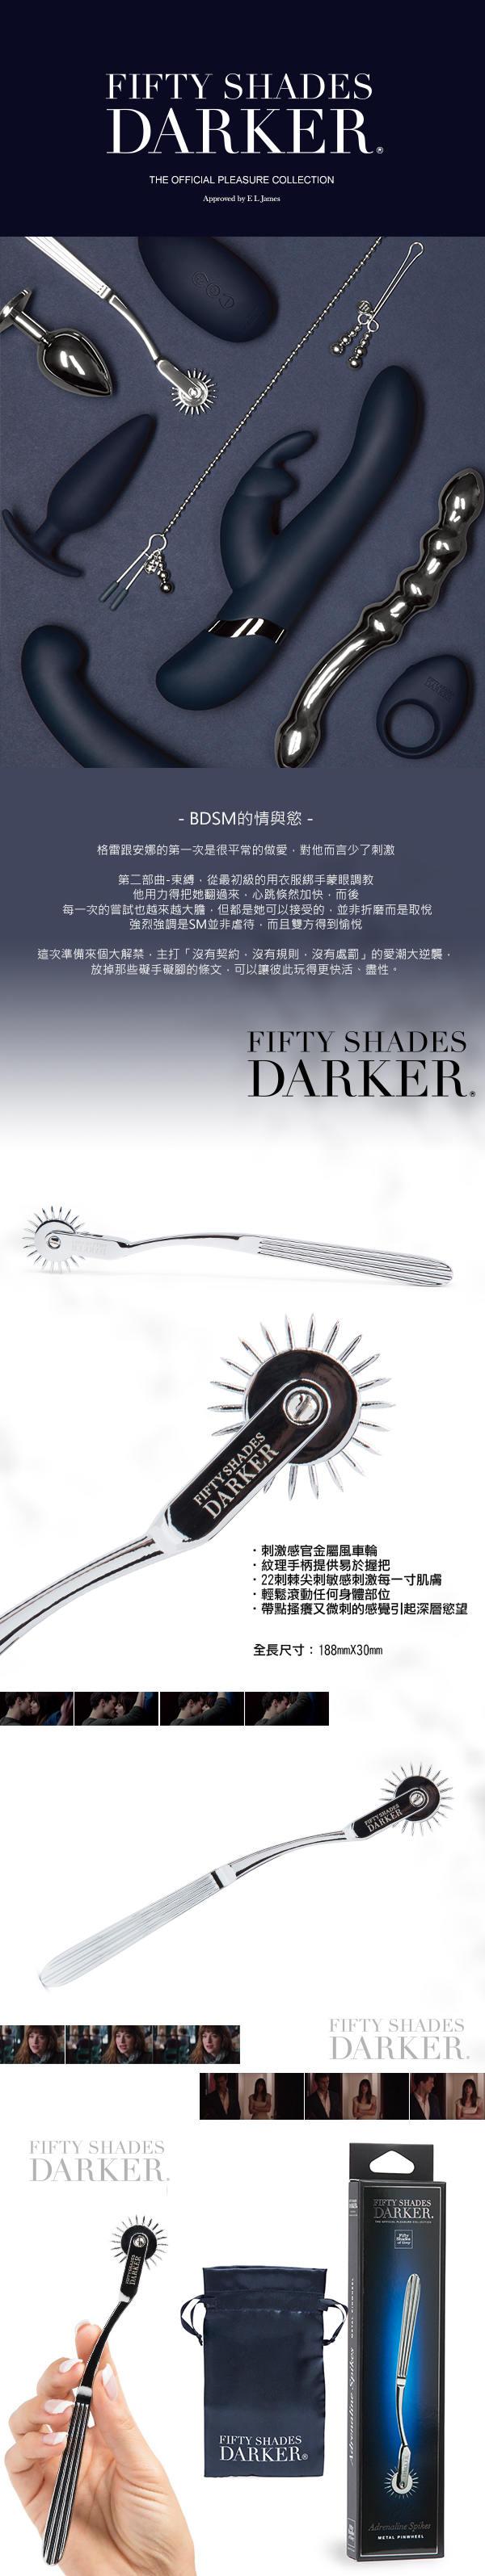 Fifty Shades Darker 格雷的五十道陰影2-束縛 金屬旋轉滾輪 虐乳虐陰 刺激器